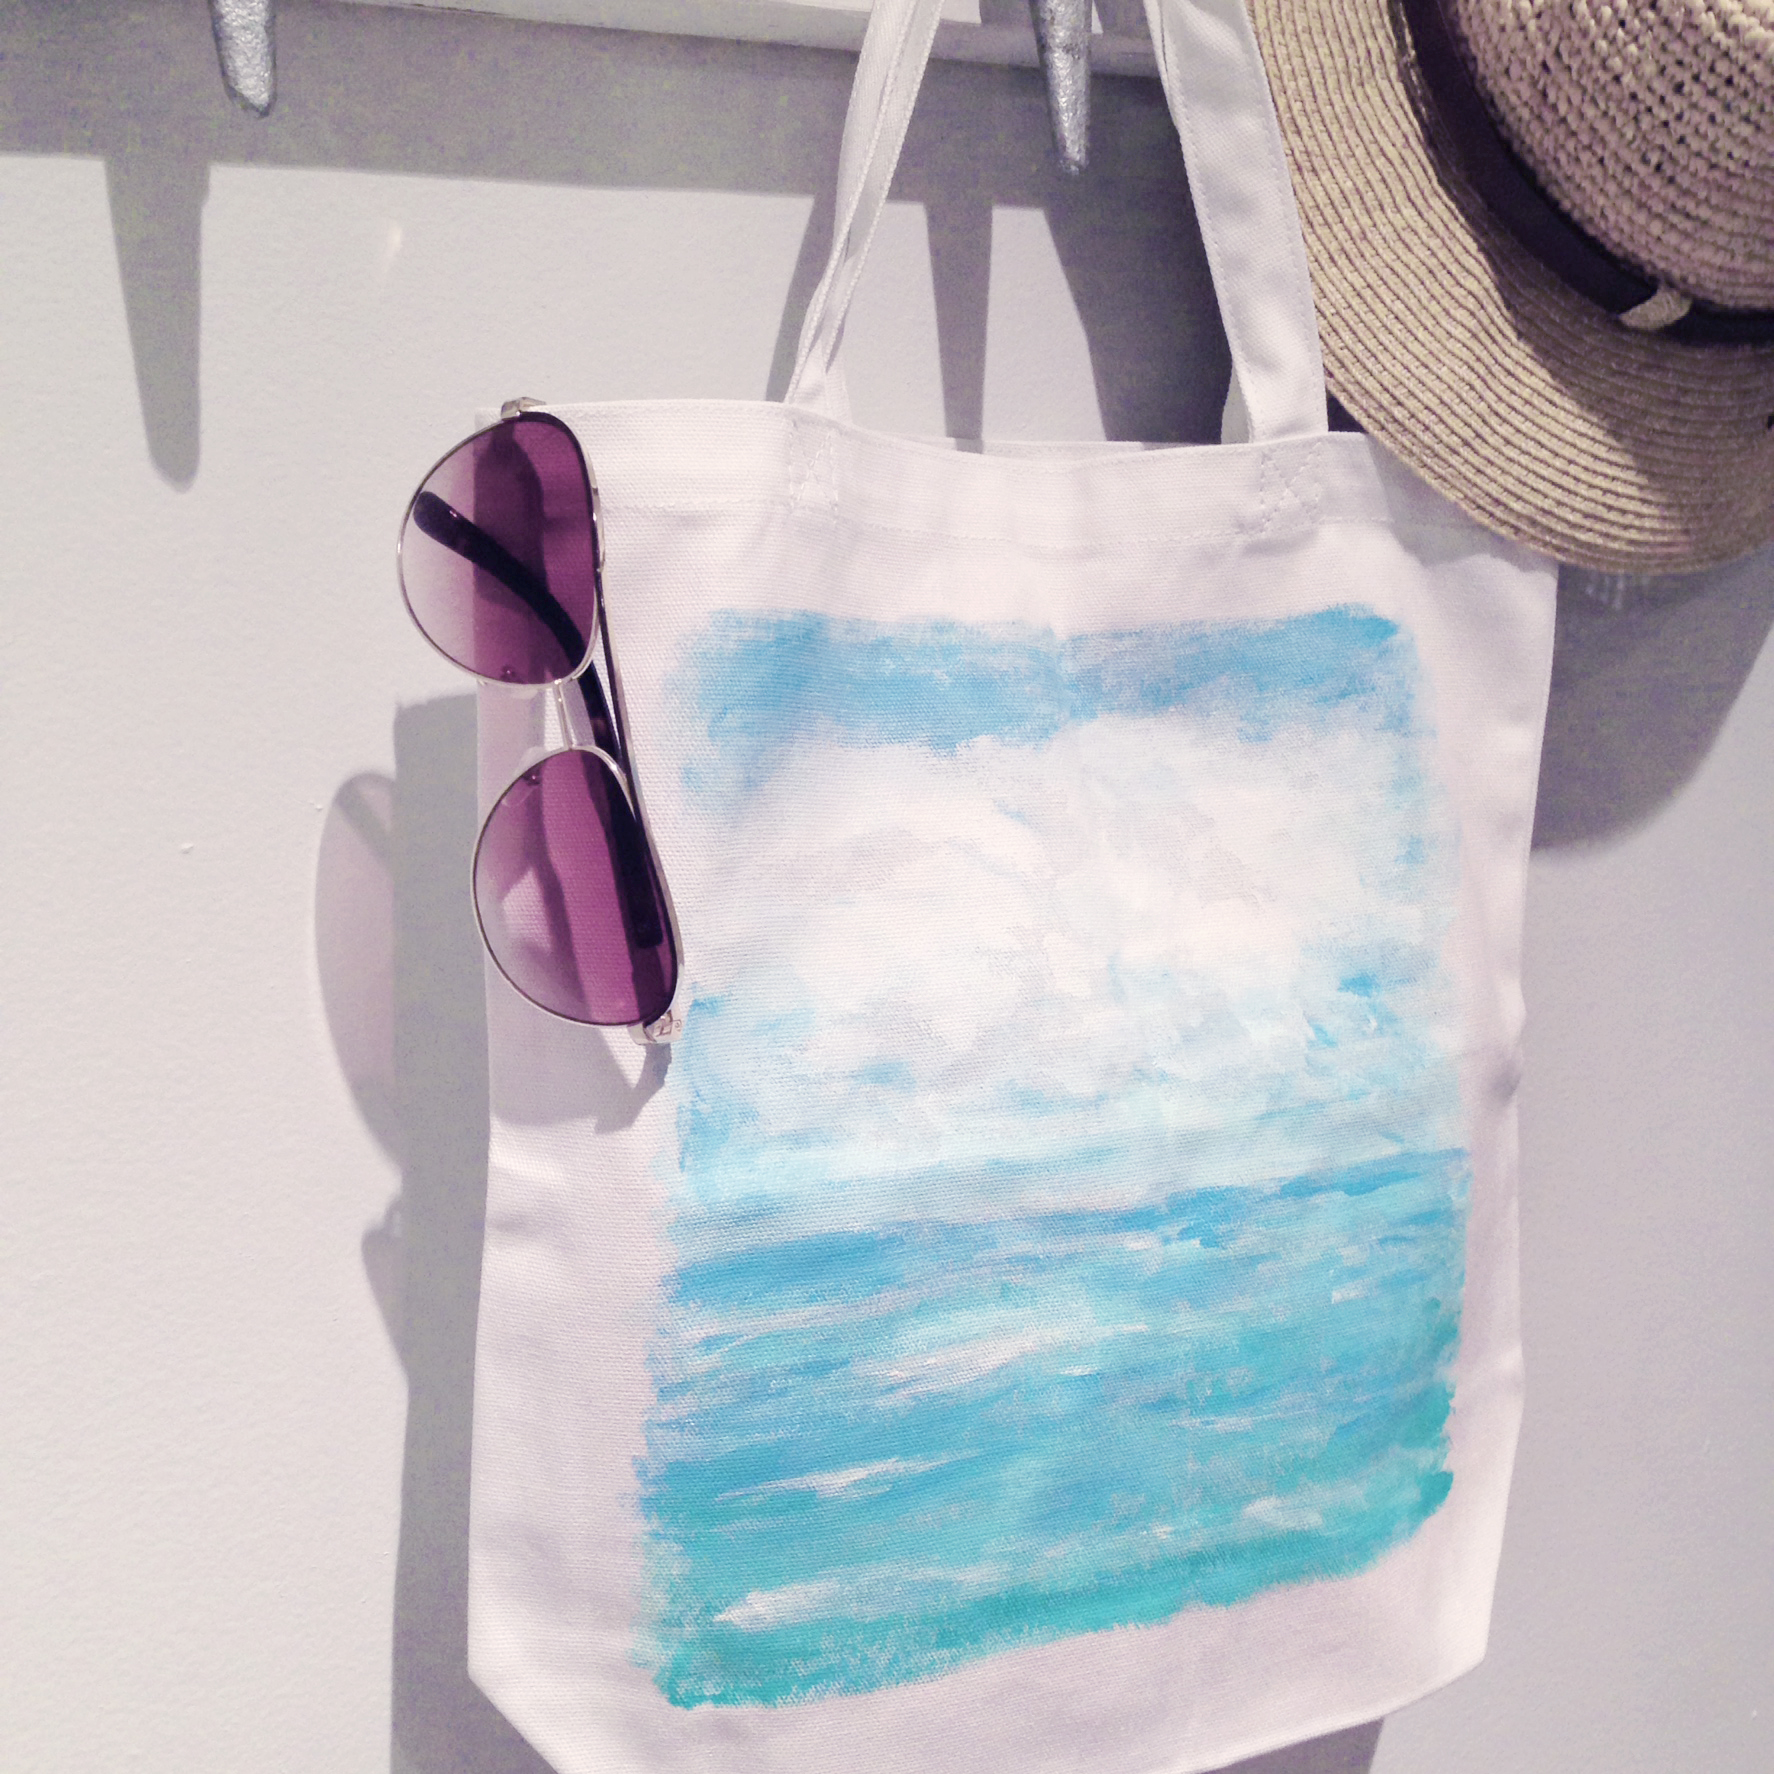 Sea Blues Tote Bag | Original Acrylic Painting on White Canvas Tote Bag | Hello Monday Design